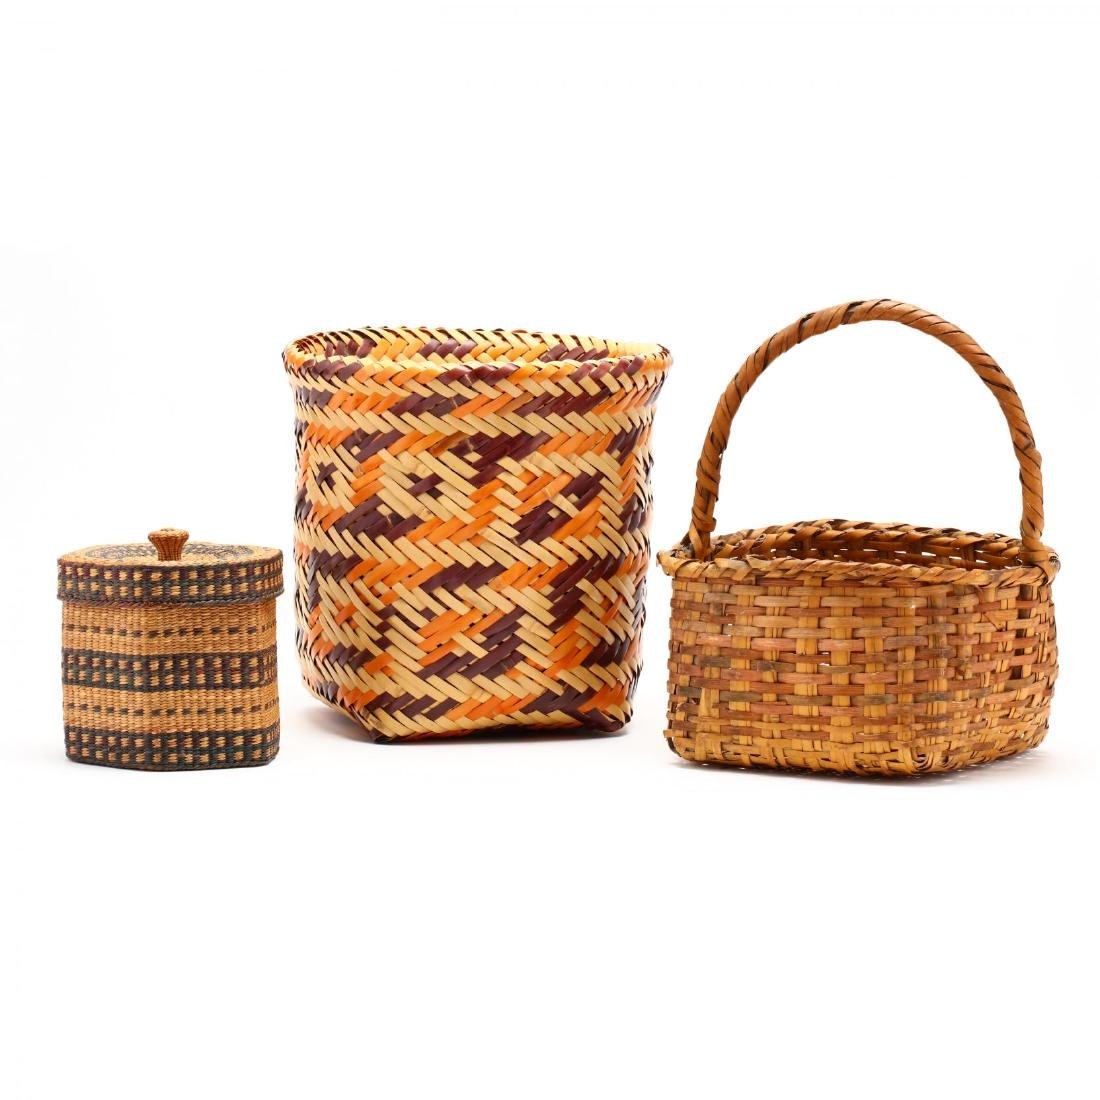 Three Native American Baskets